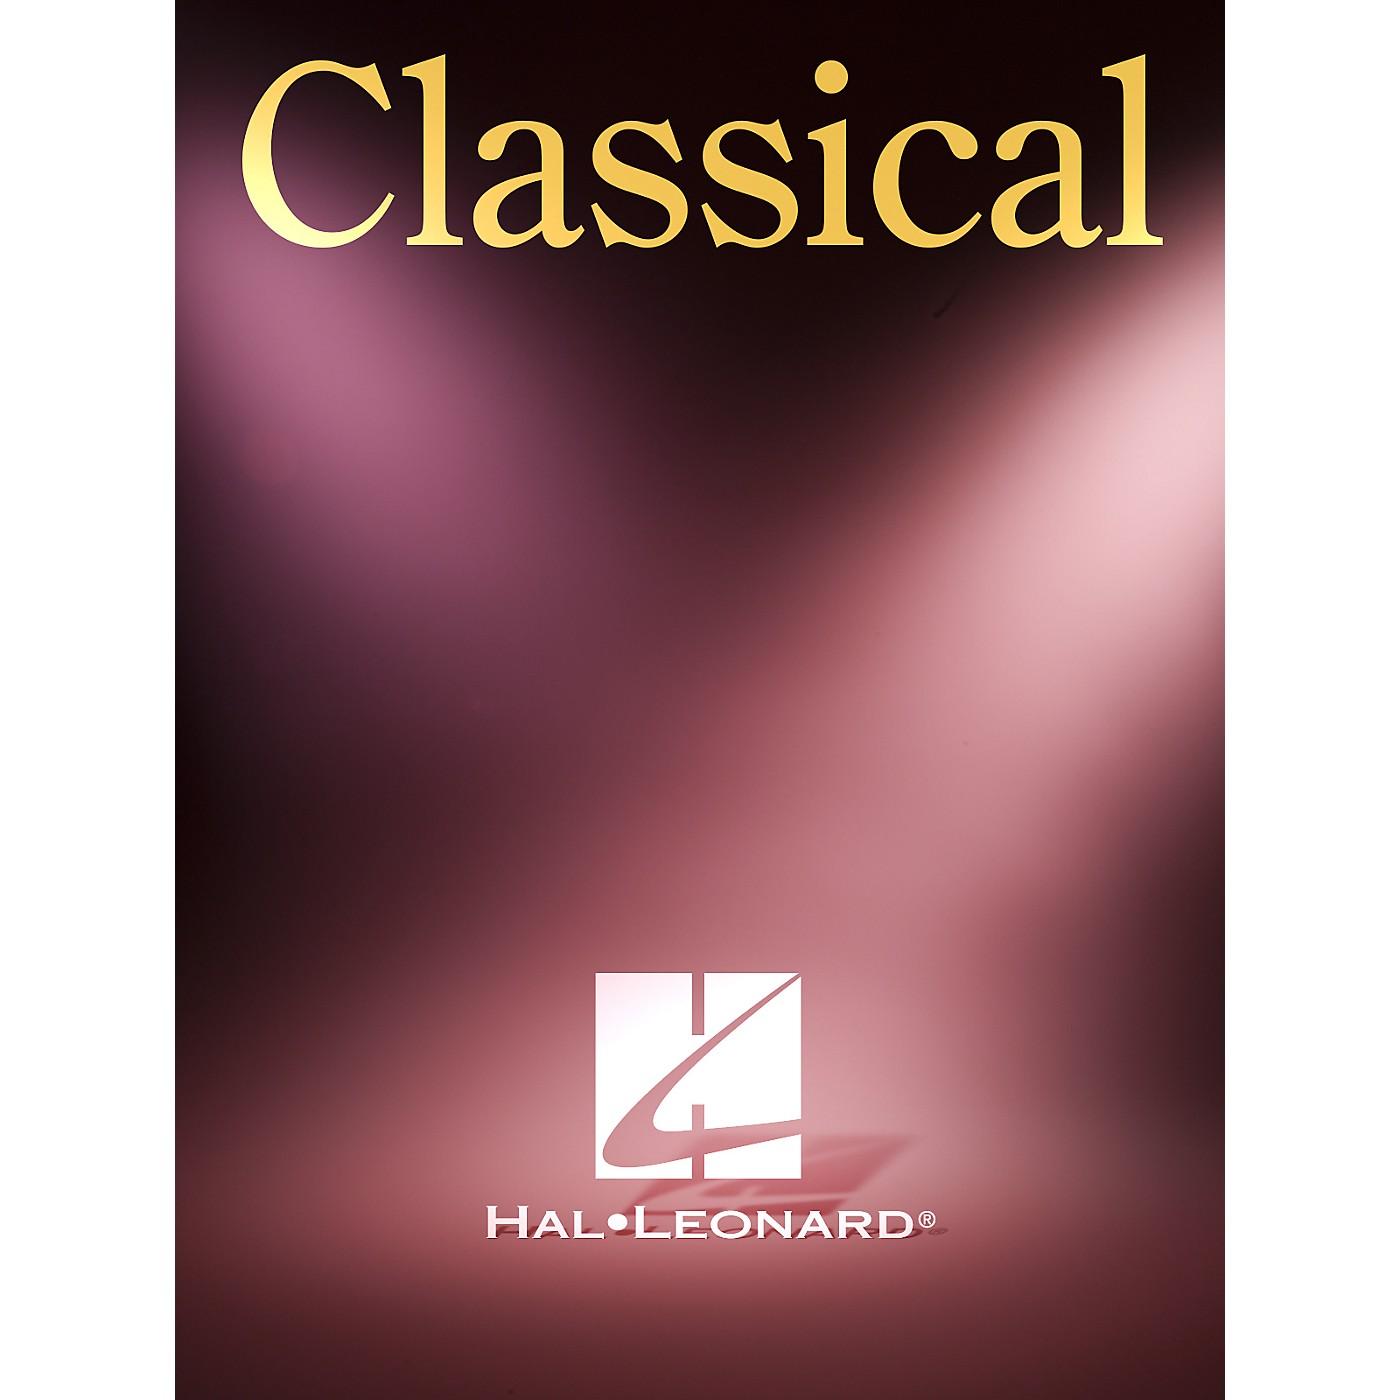 Associated Sonatina No. 4 (Piano Solo) Piano Large Works Series by Camargo Guarnieri thumbnail